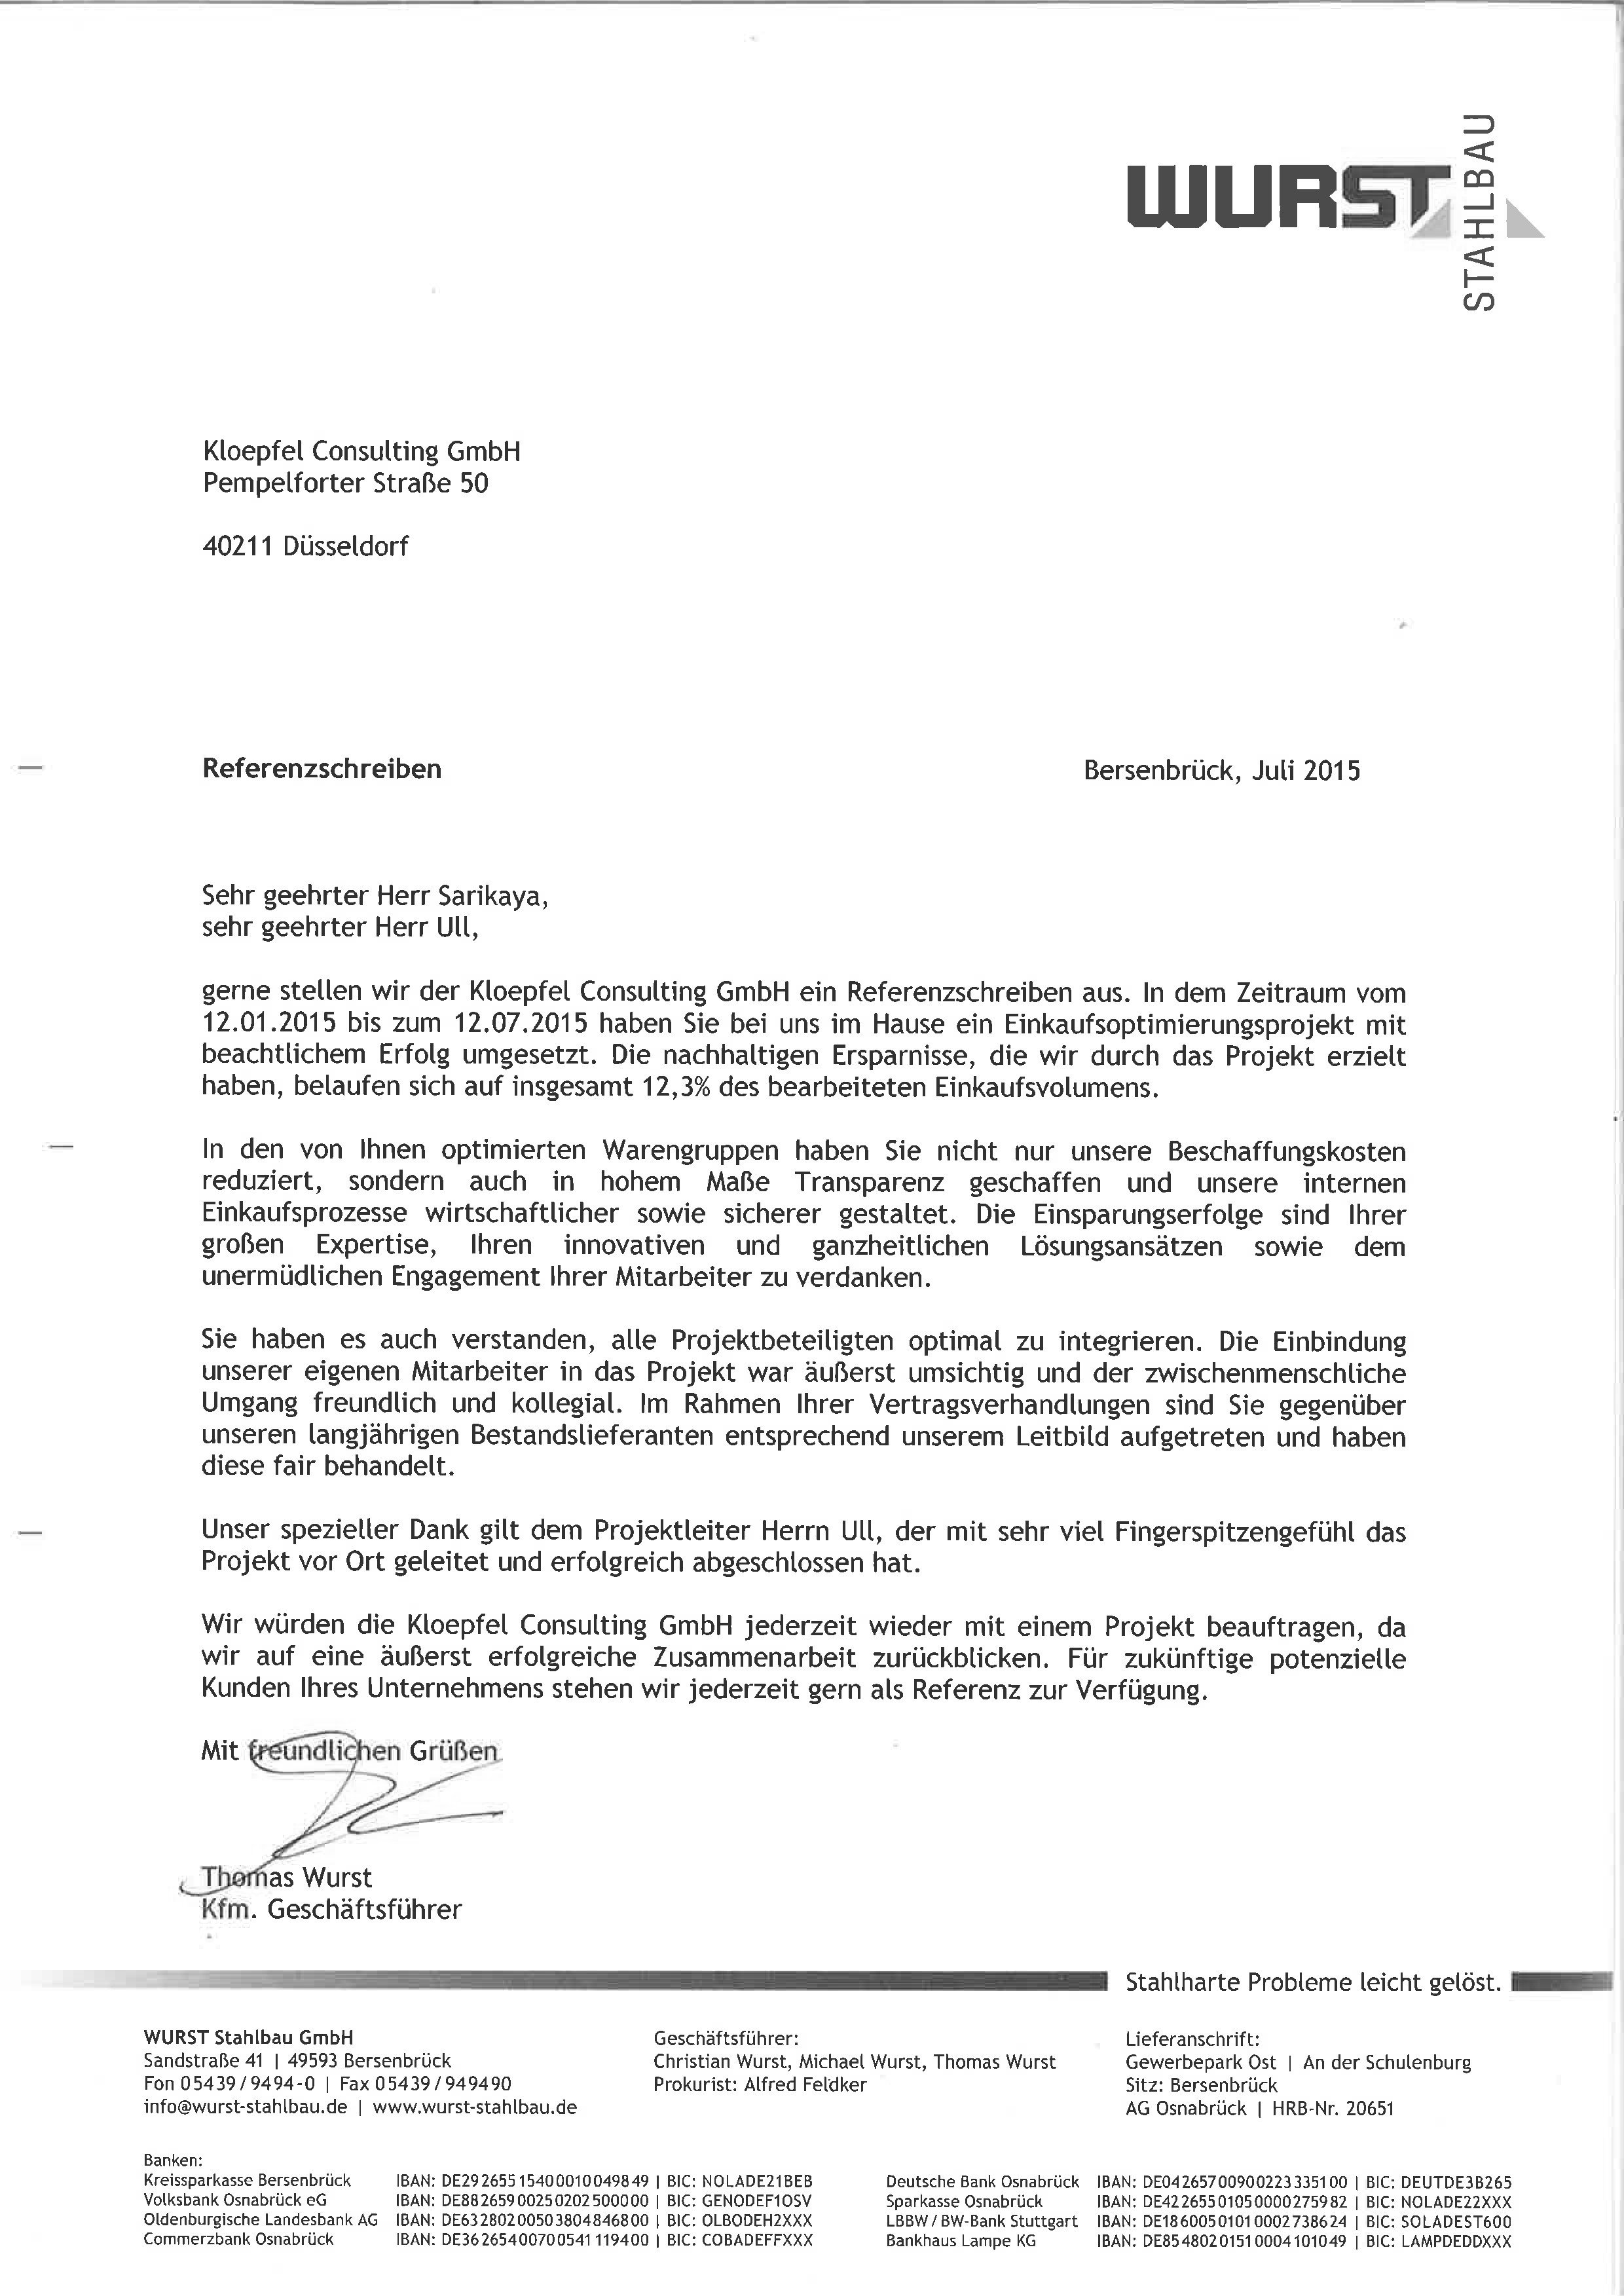 Wurst Stahlbau   Kloepfel Consulting GmbH on